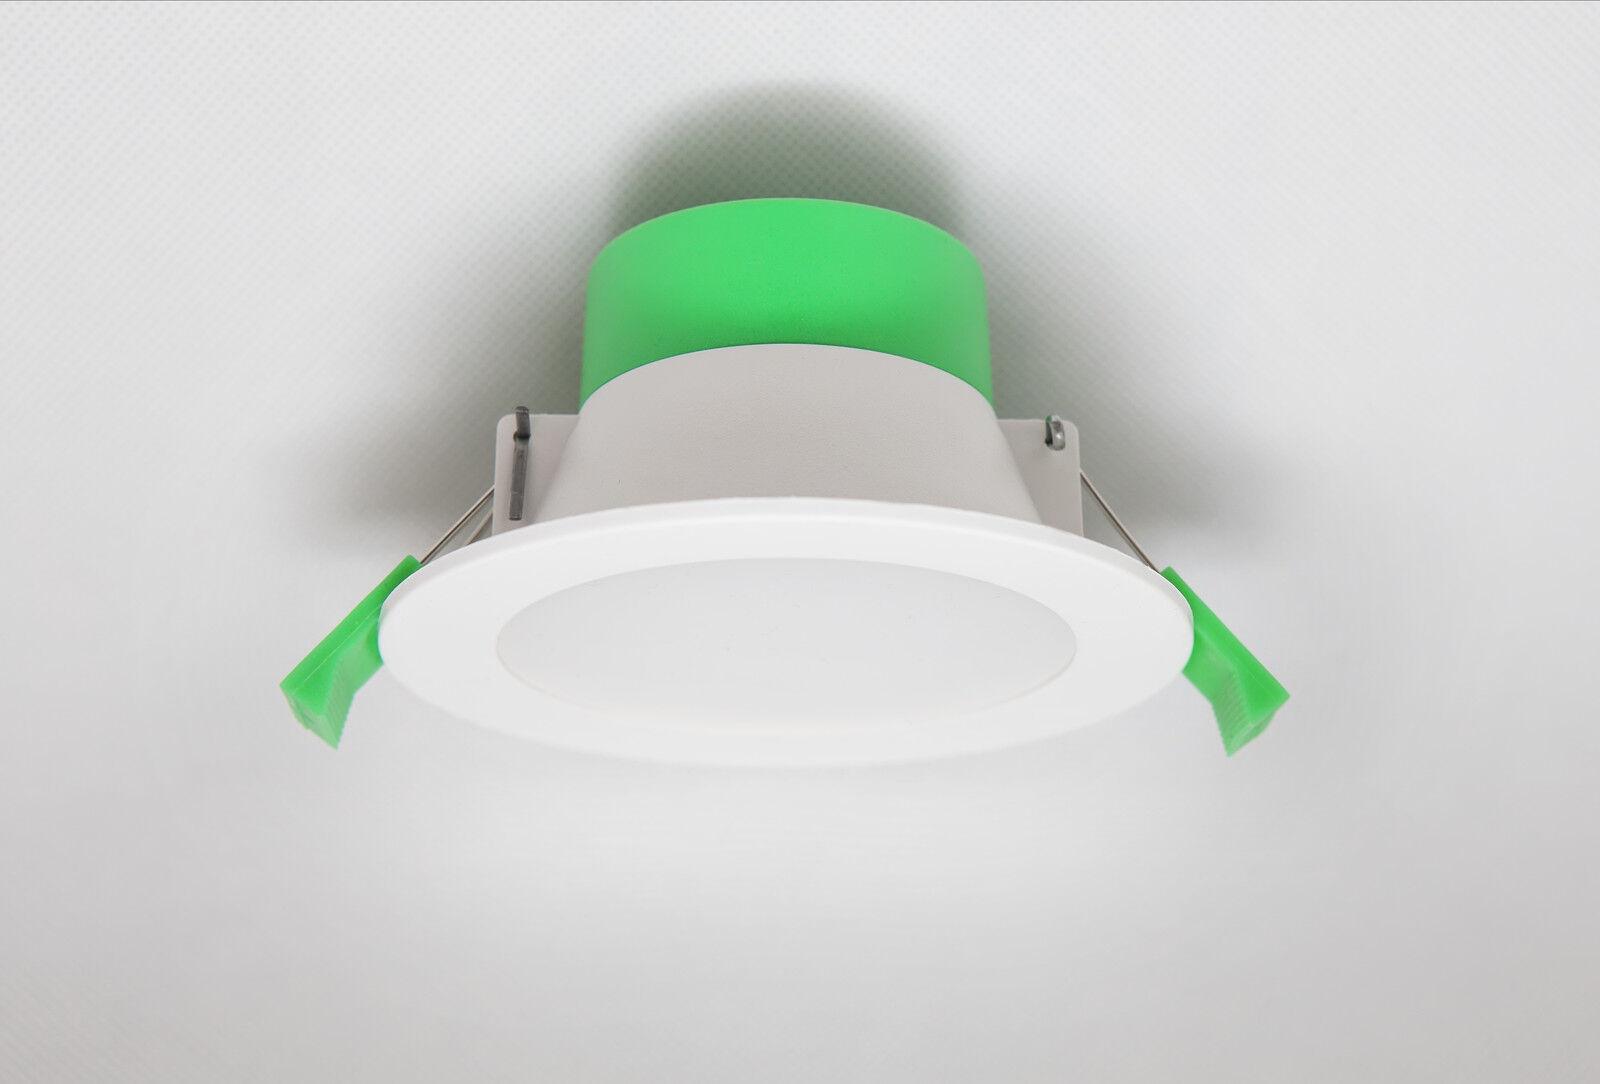 10 x 10W LED DOWNLIGHT KIT WARM & COOL WHITE & SATIN FRAME DIMMABLE NON DIM  down